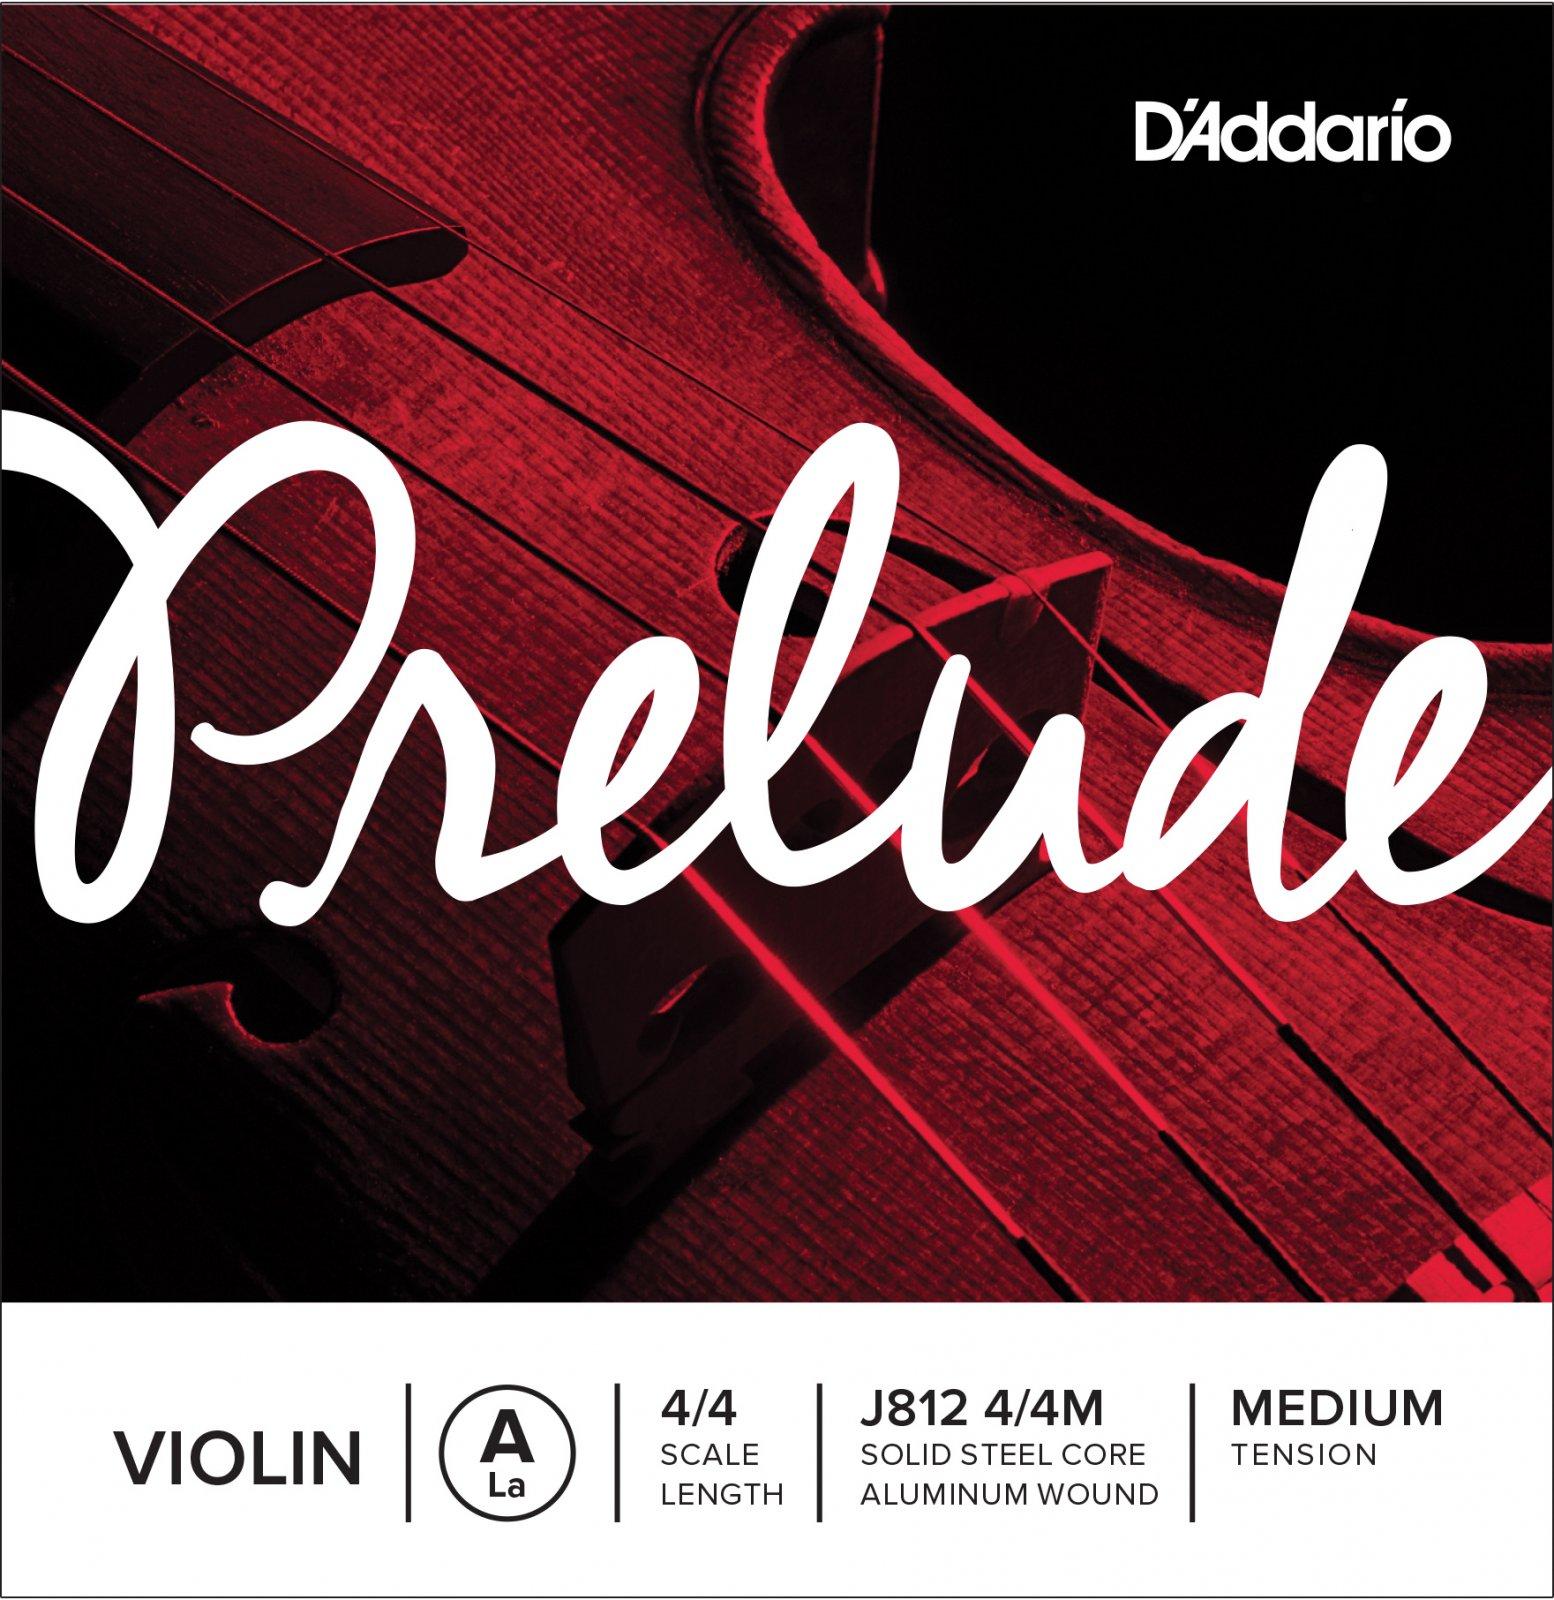 D'Addario J812 Prelude Violin Single A String Medium Tension 1/2 3/4 4/4